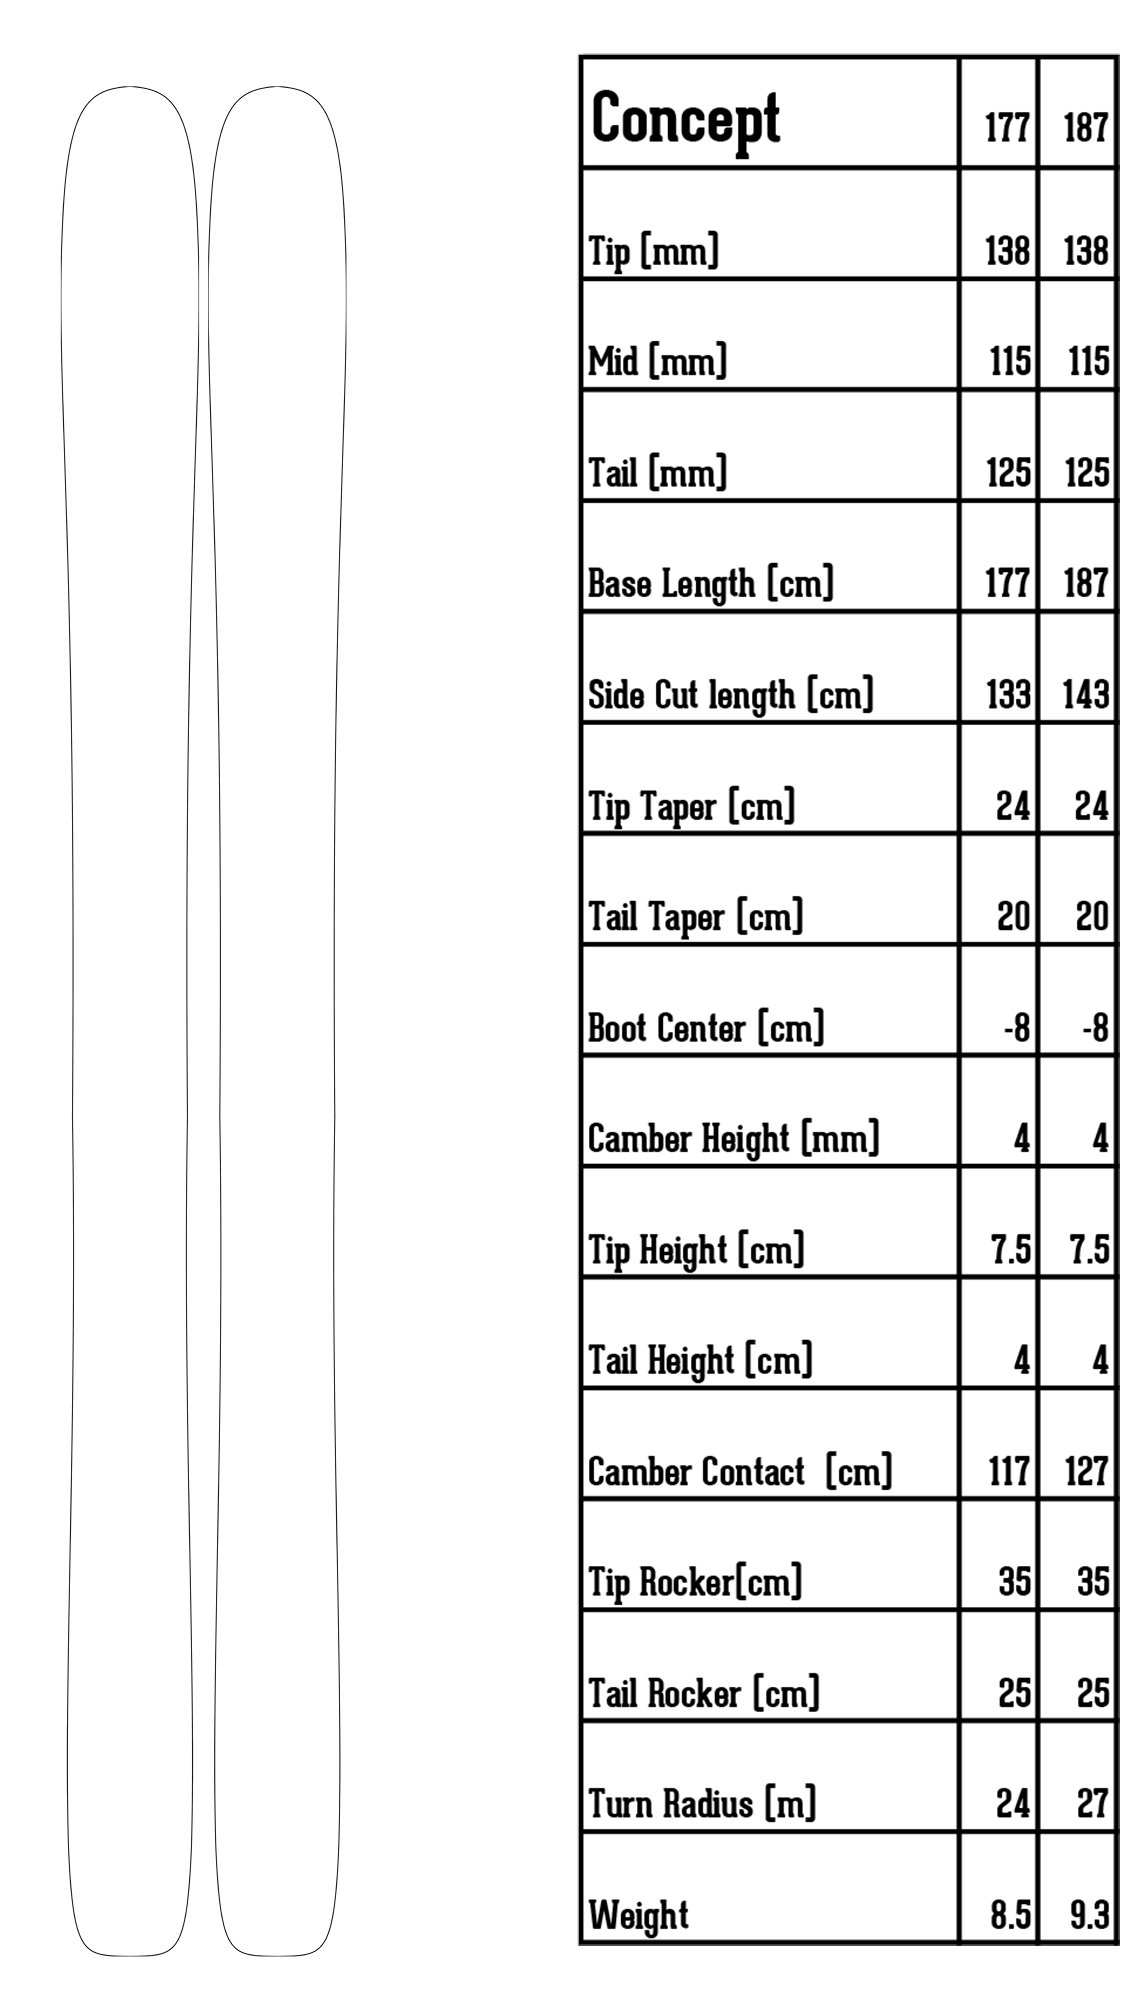 Concept ski information spec sheet rocker camber tip tail height weight